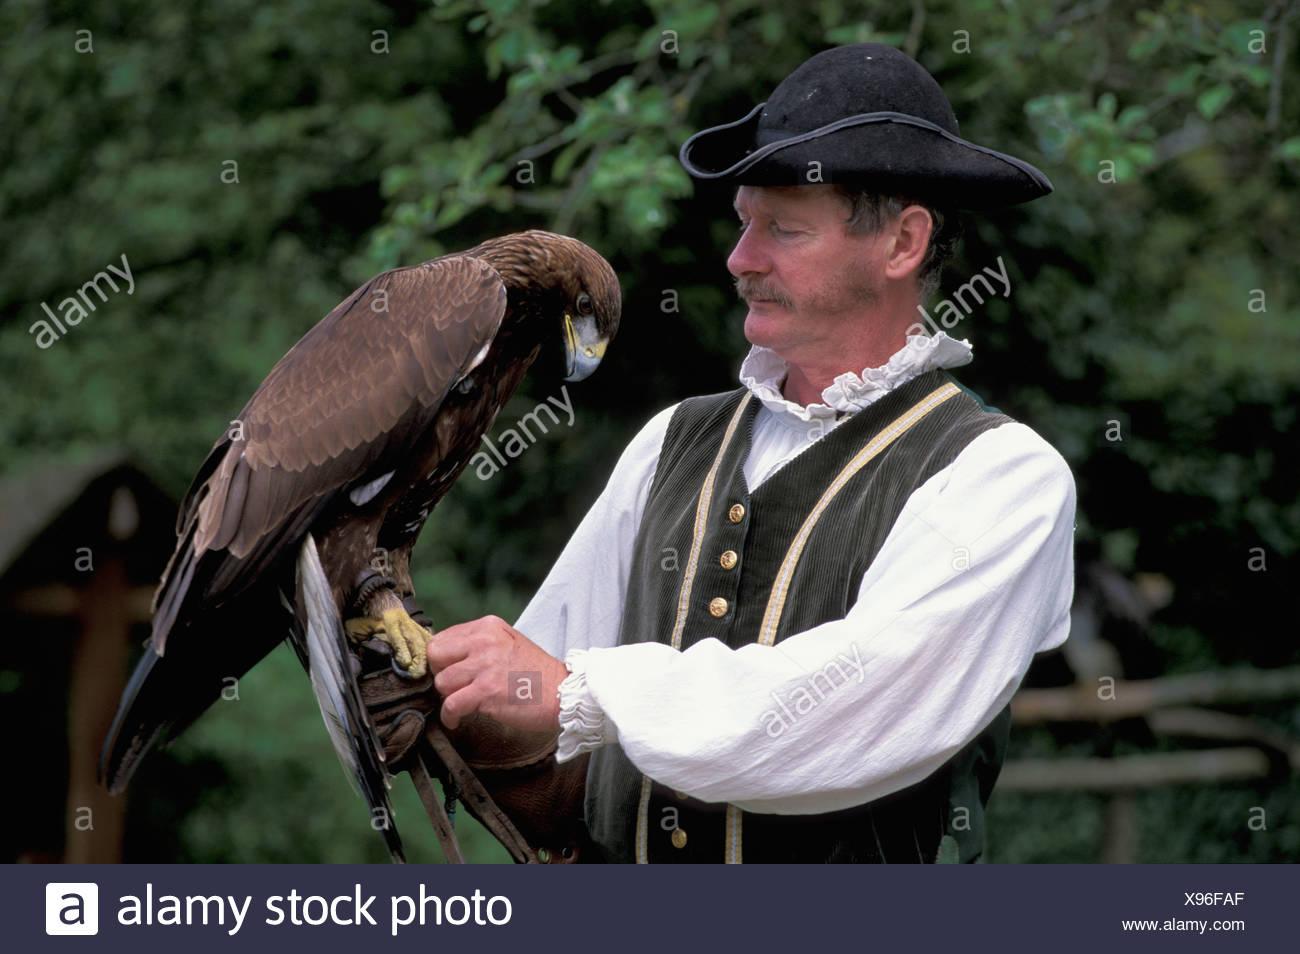 Birds of Prey, Show, Chateau la Bourbansais, Brittany, Bretagne, France, Europe, man - Stock Image